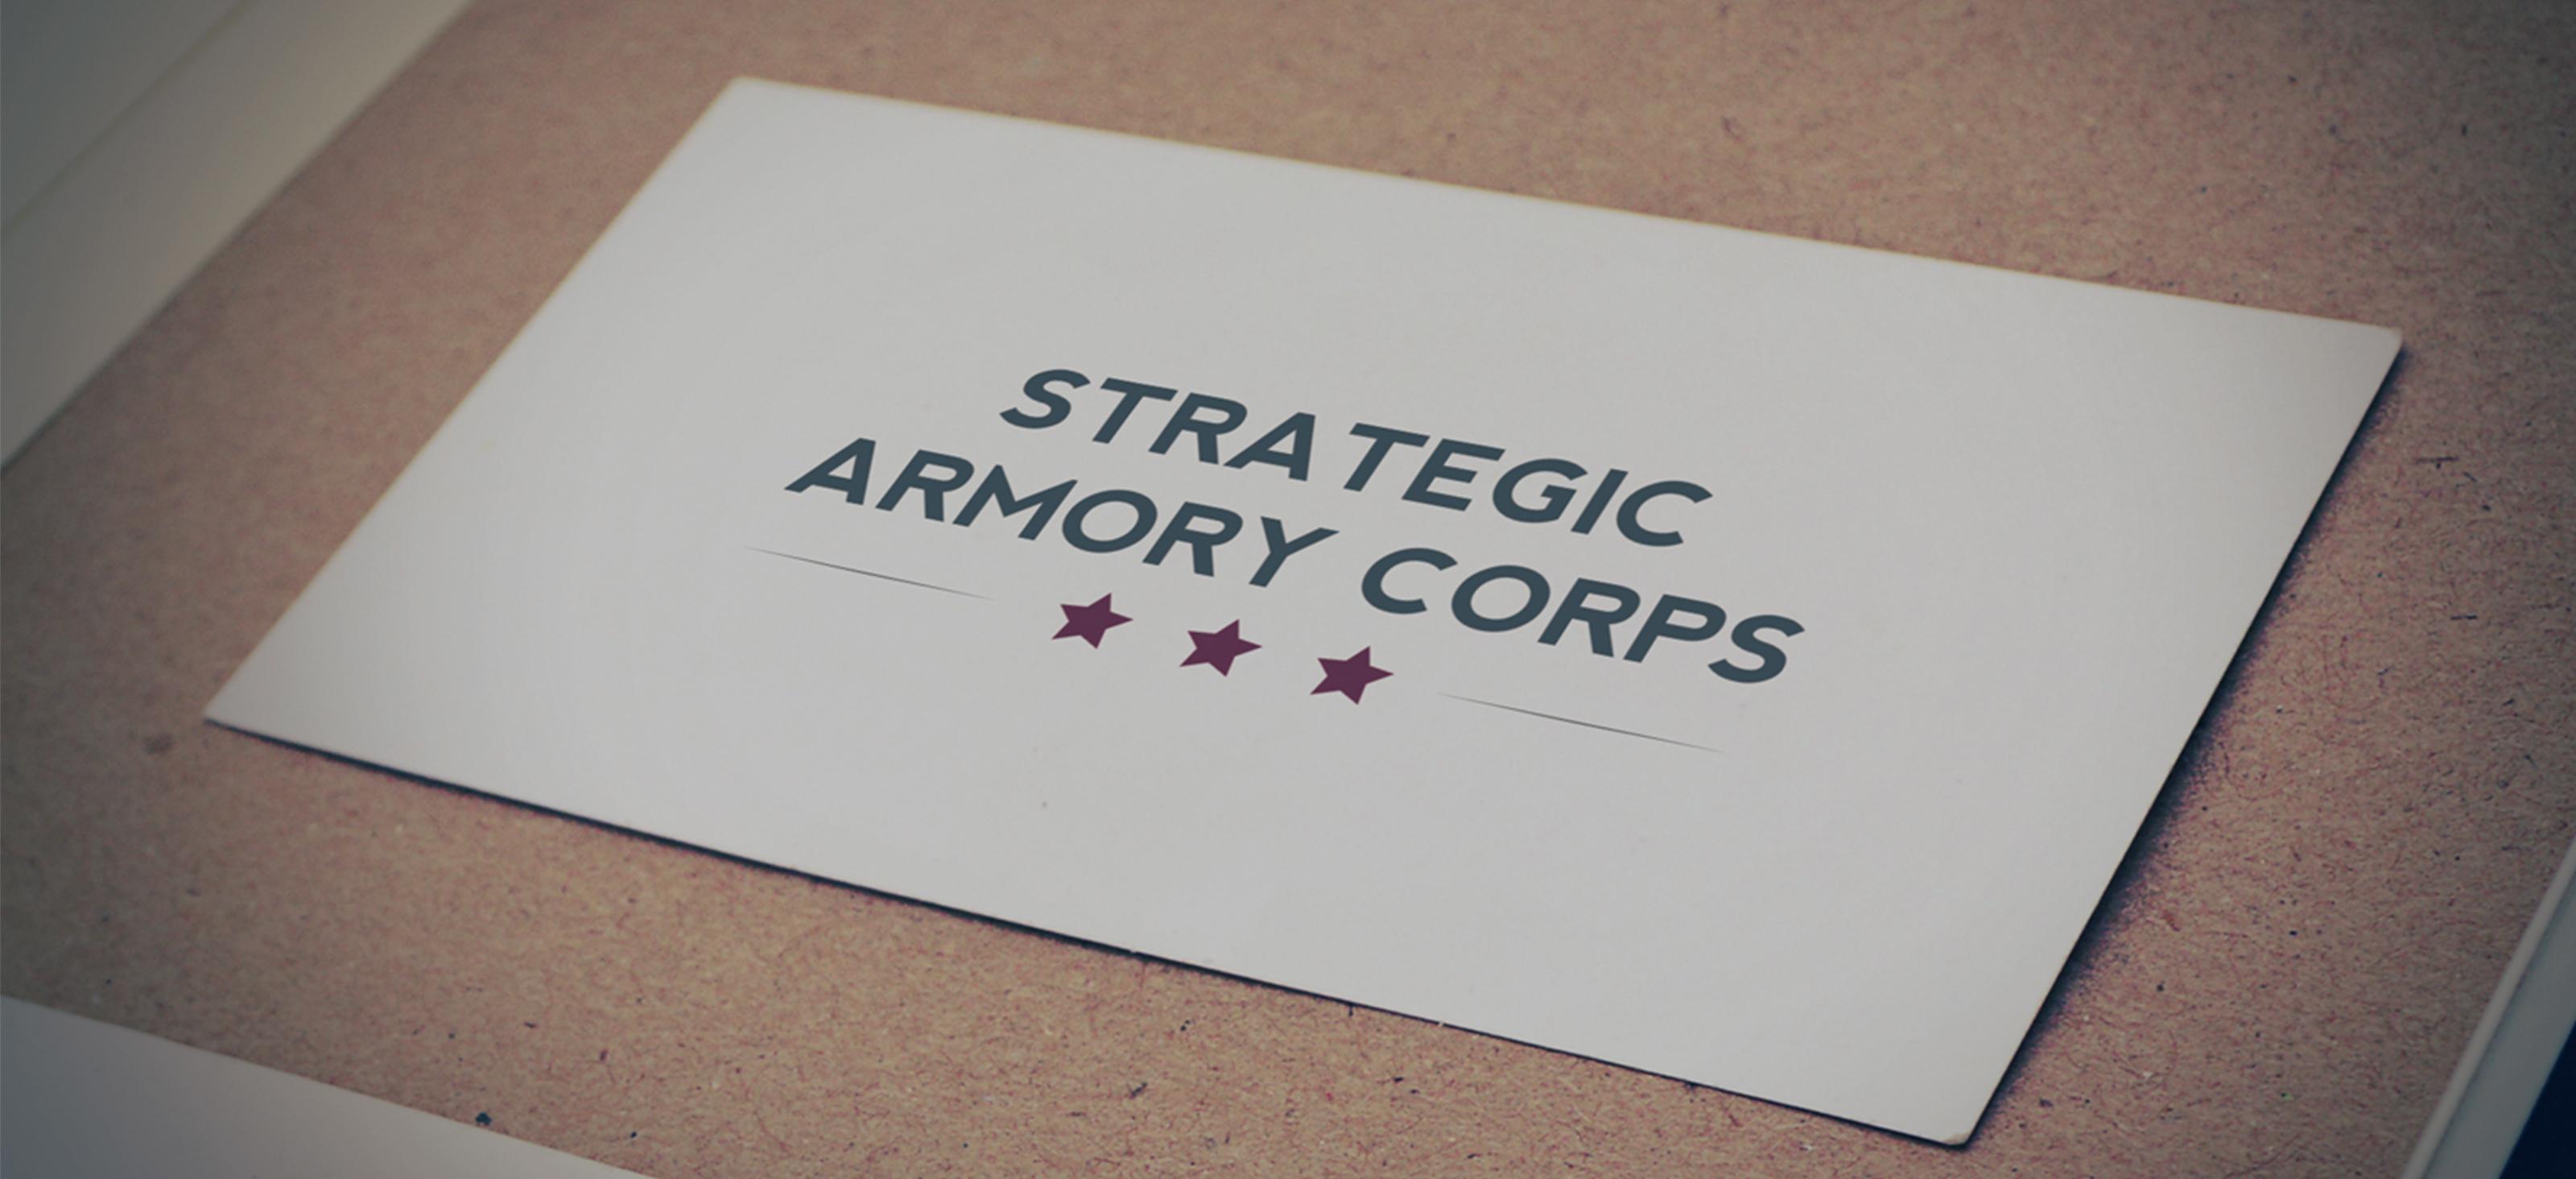 Strategic Armory Corps logo